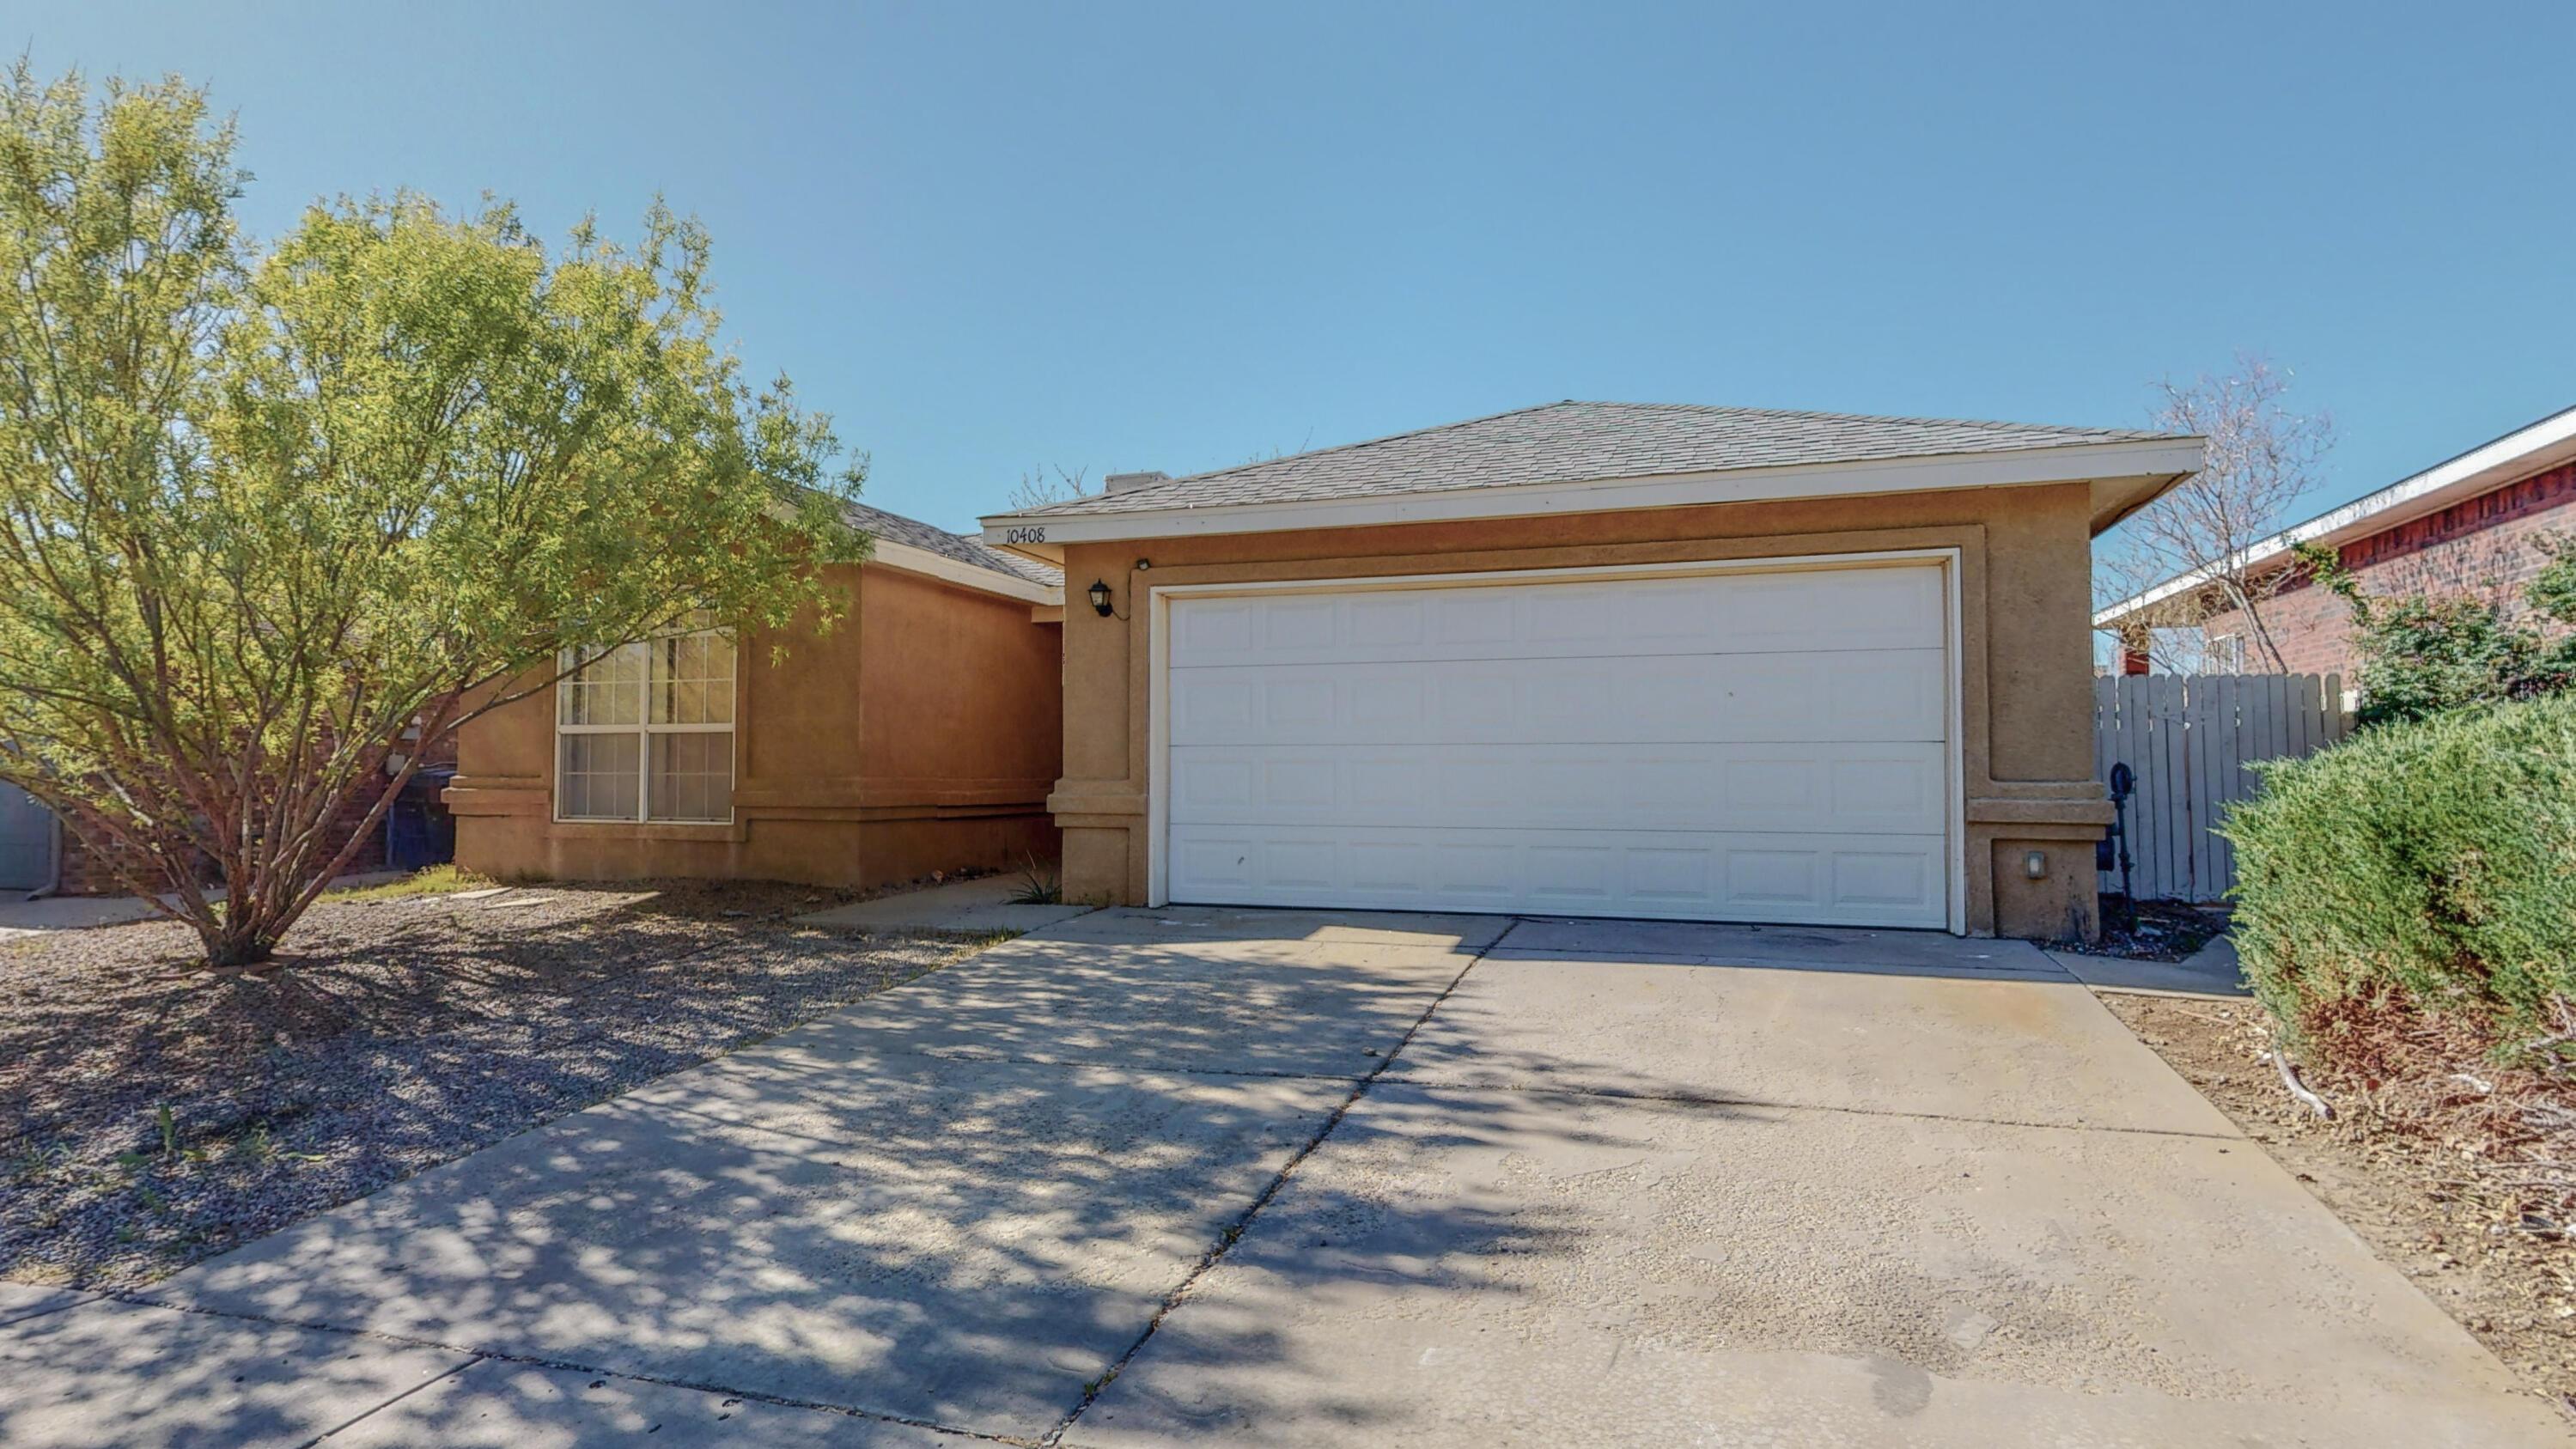 10408 HACKAMORE Place, Albuquerque NM 87121